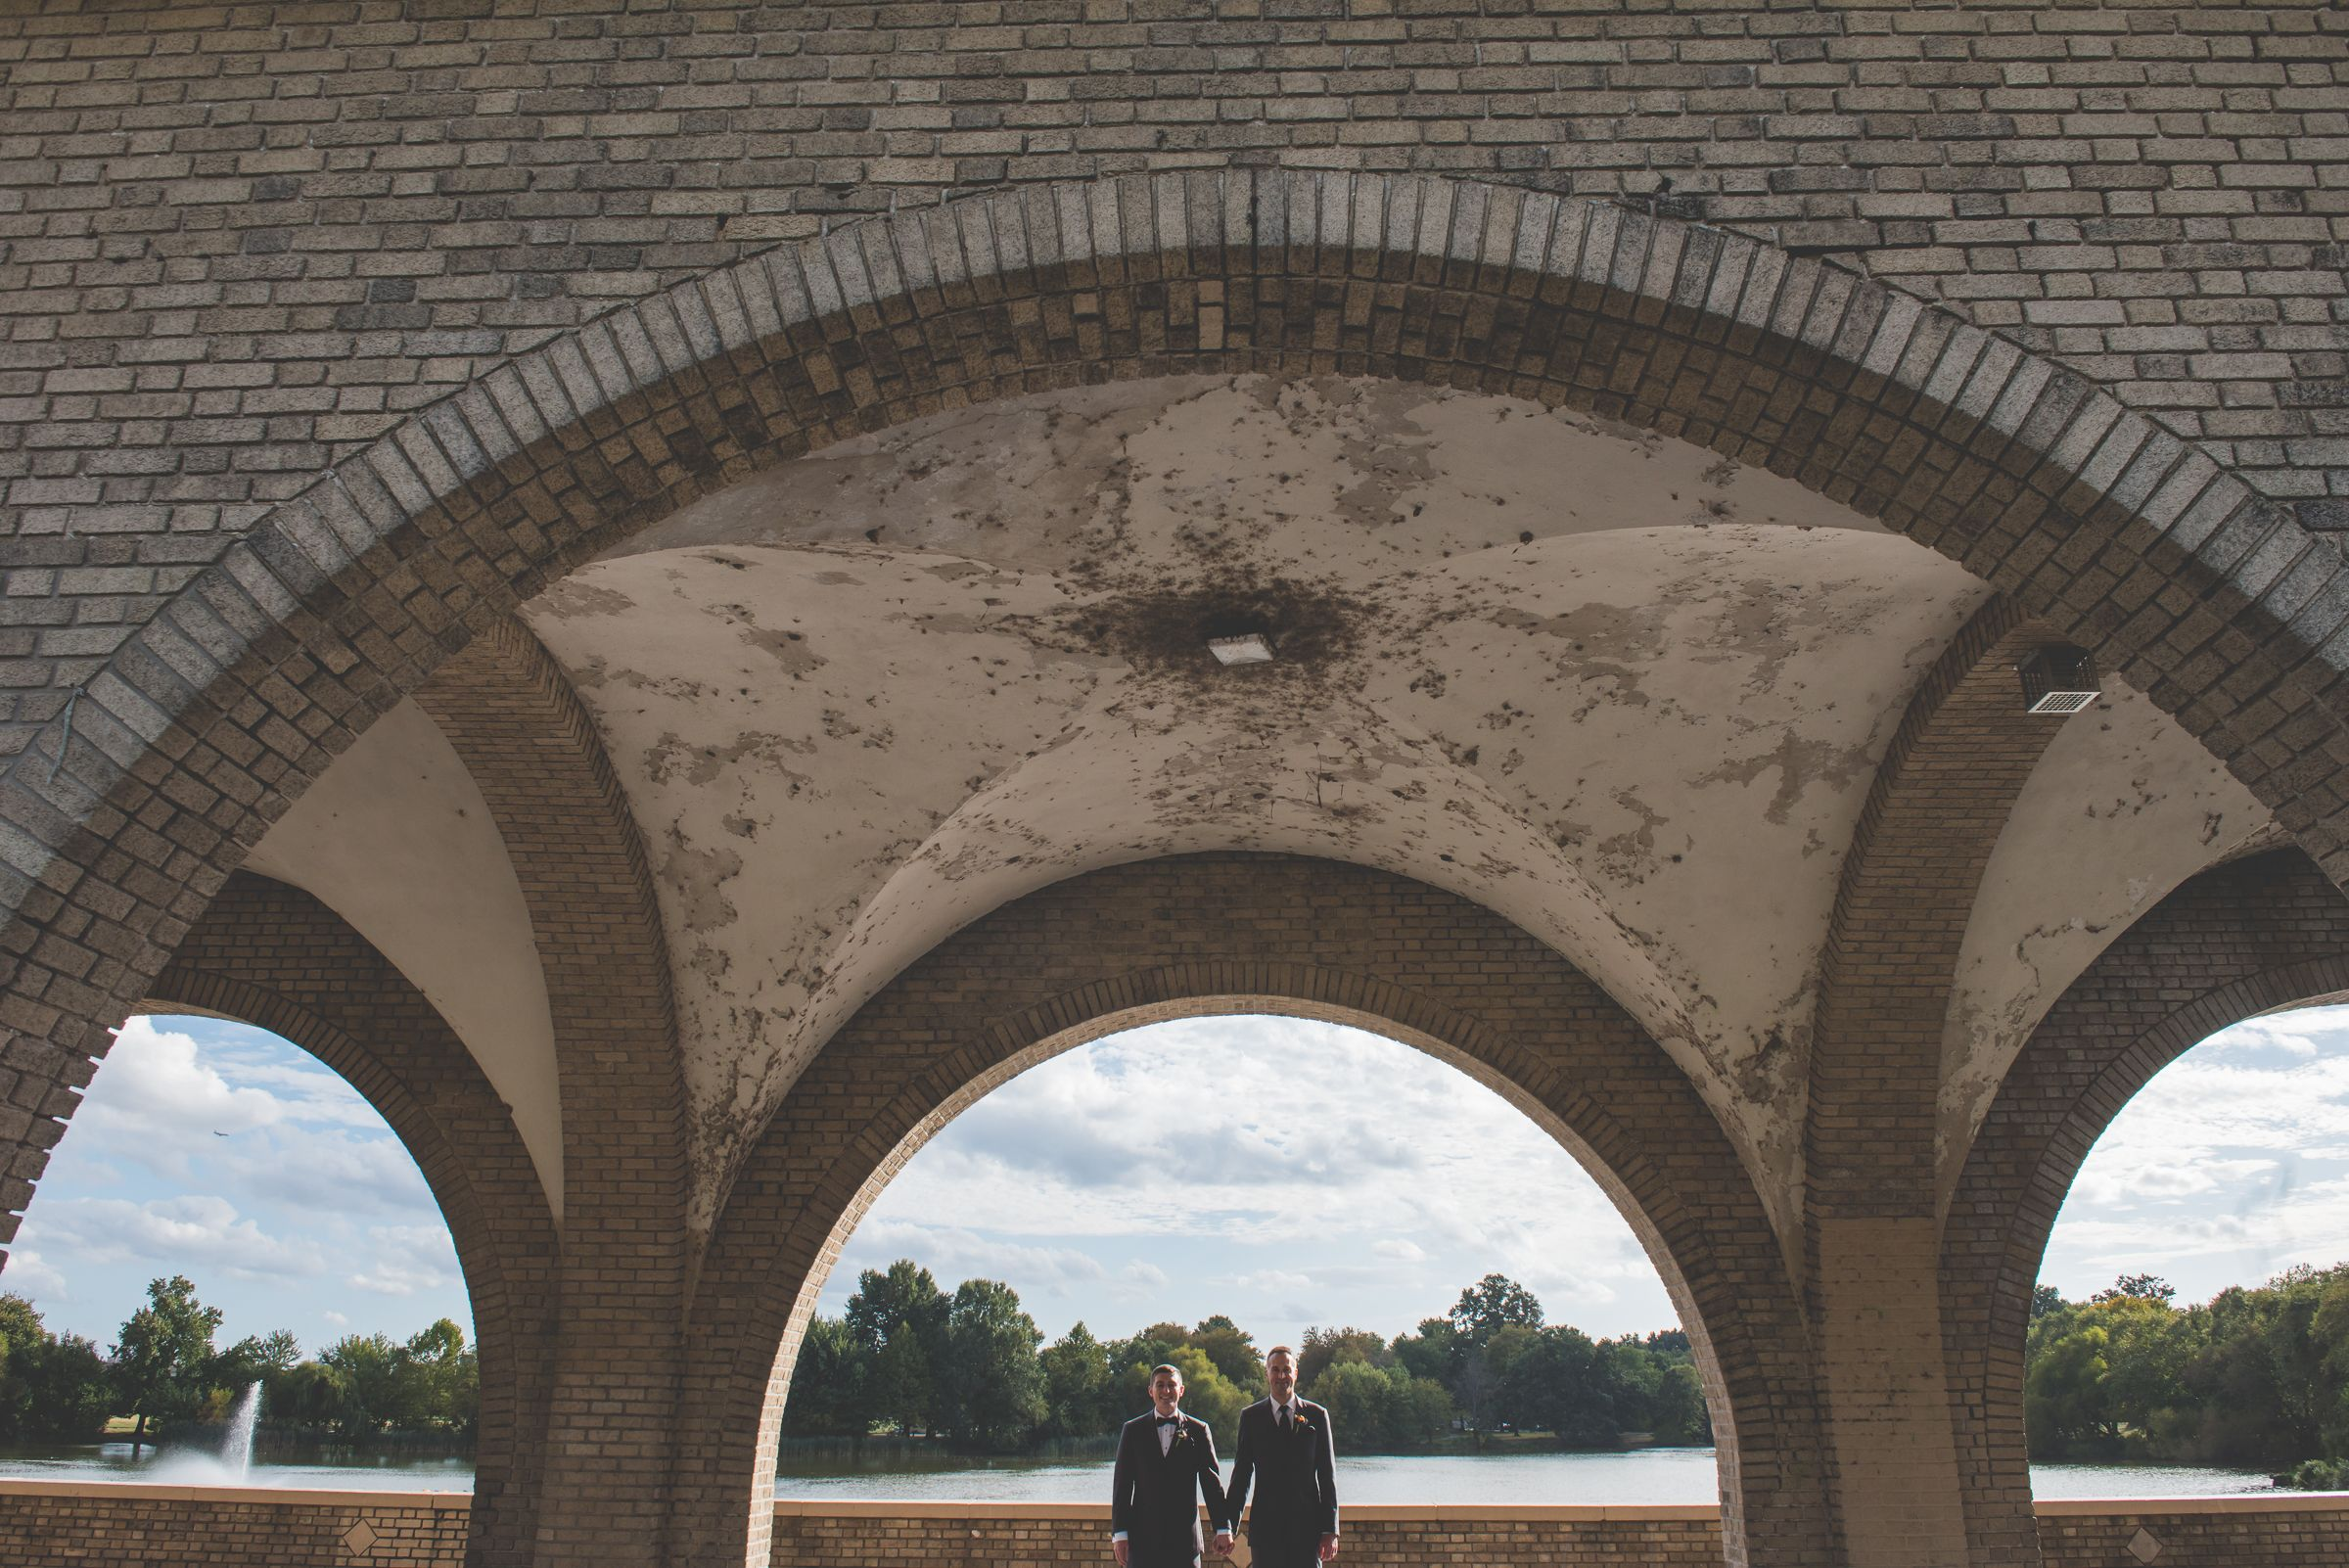 Garrett u joshus same sex wedding at the american swedish historical